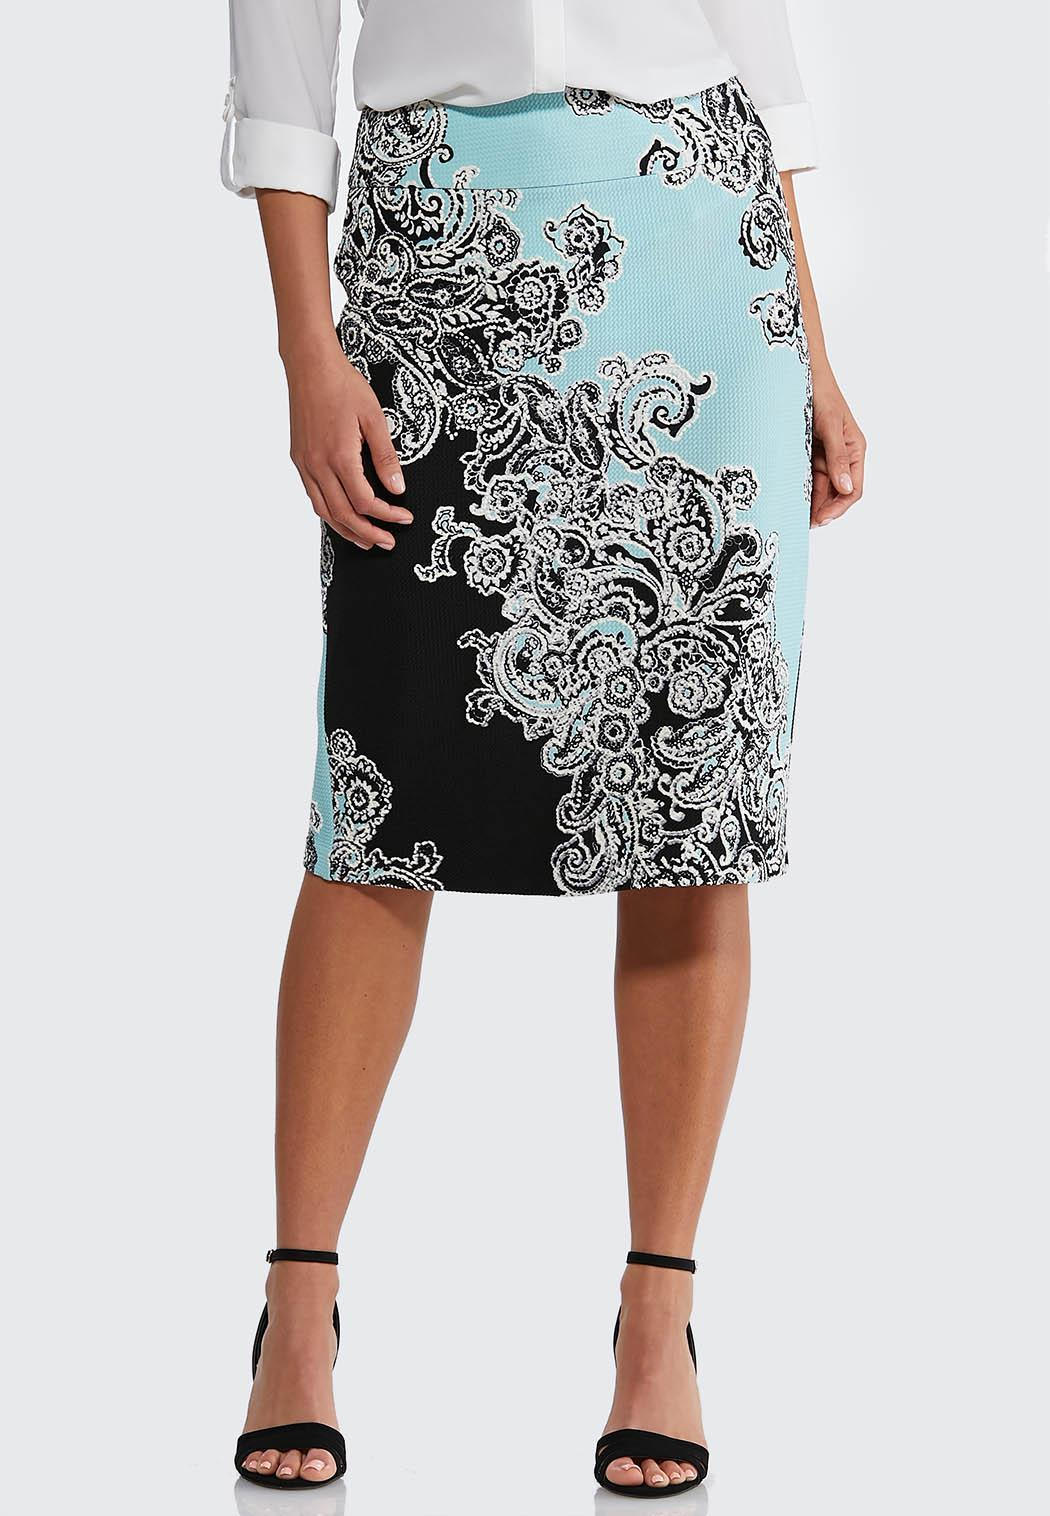 6e6c609bbf Turquoise Paisley Pencil Skirt alternate view Turquoise Paisley Pencil Skirt